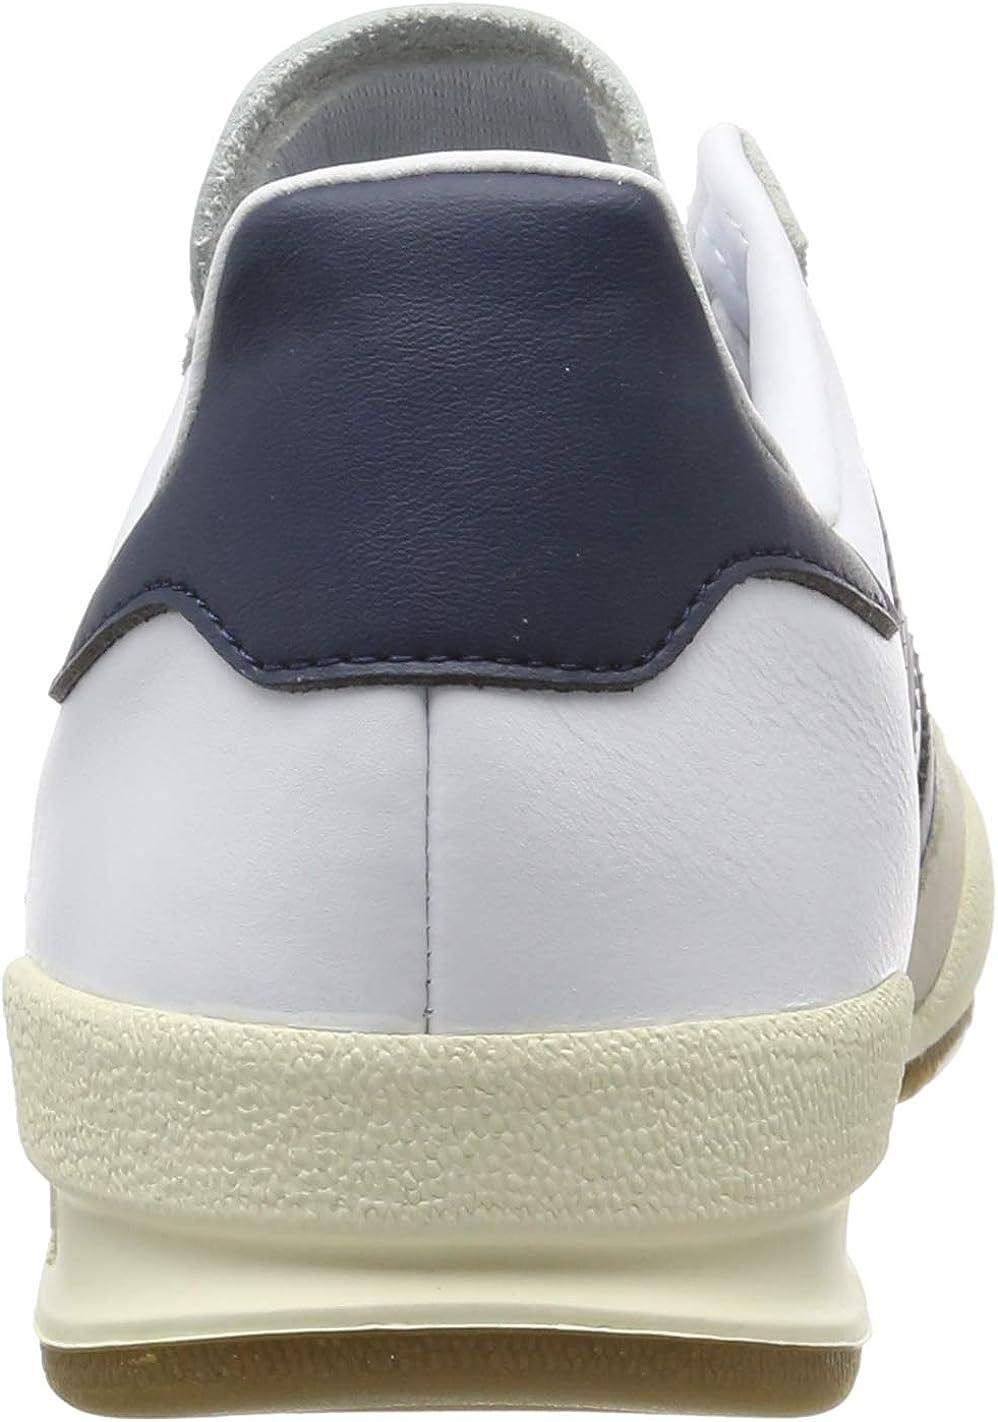 Zapatillas de Gimnasia para Hombre adidas Jeans